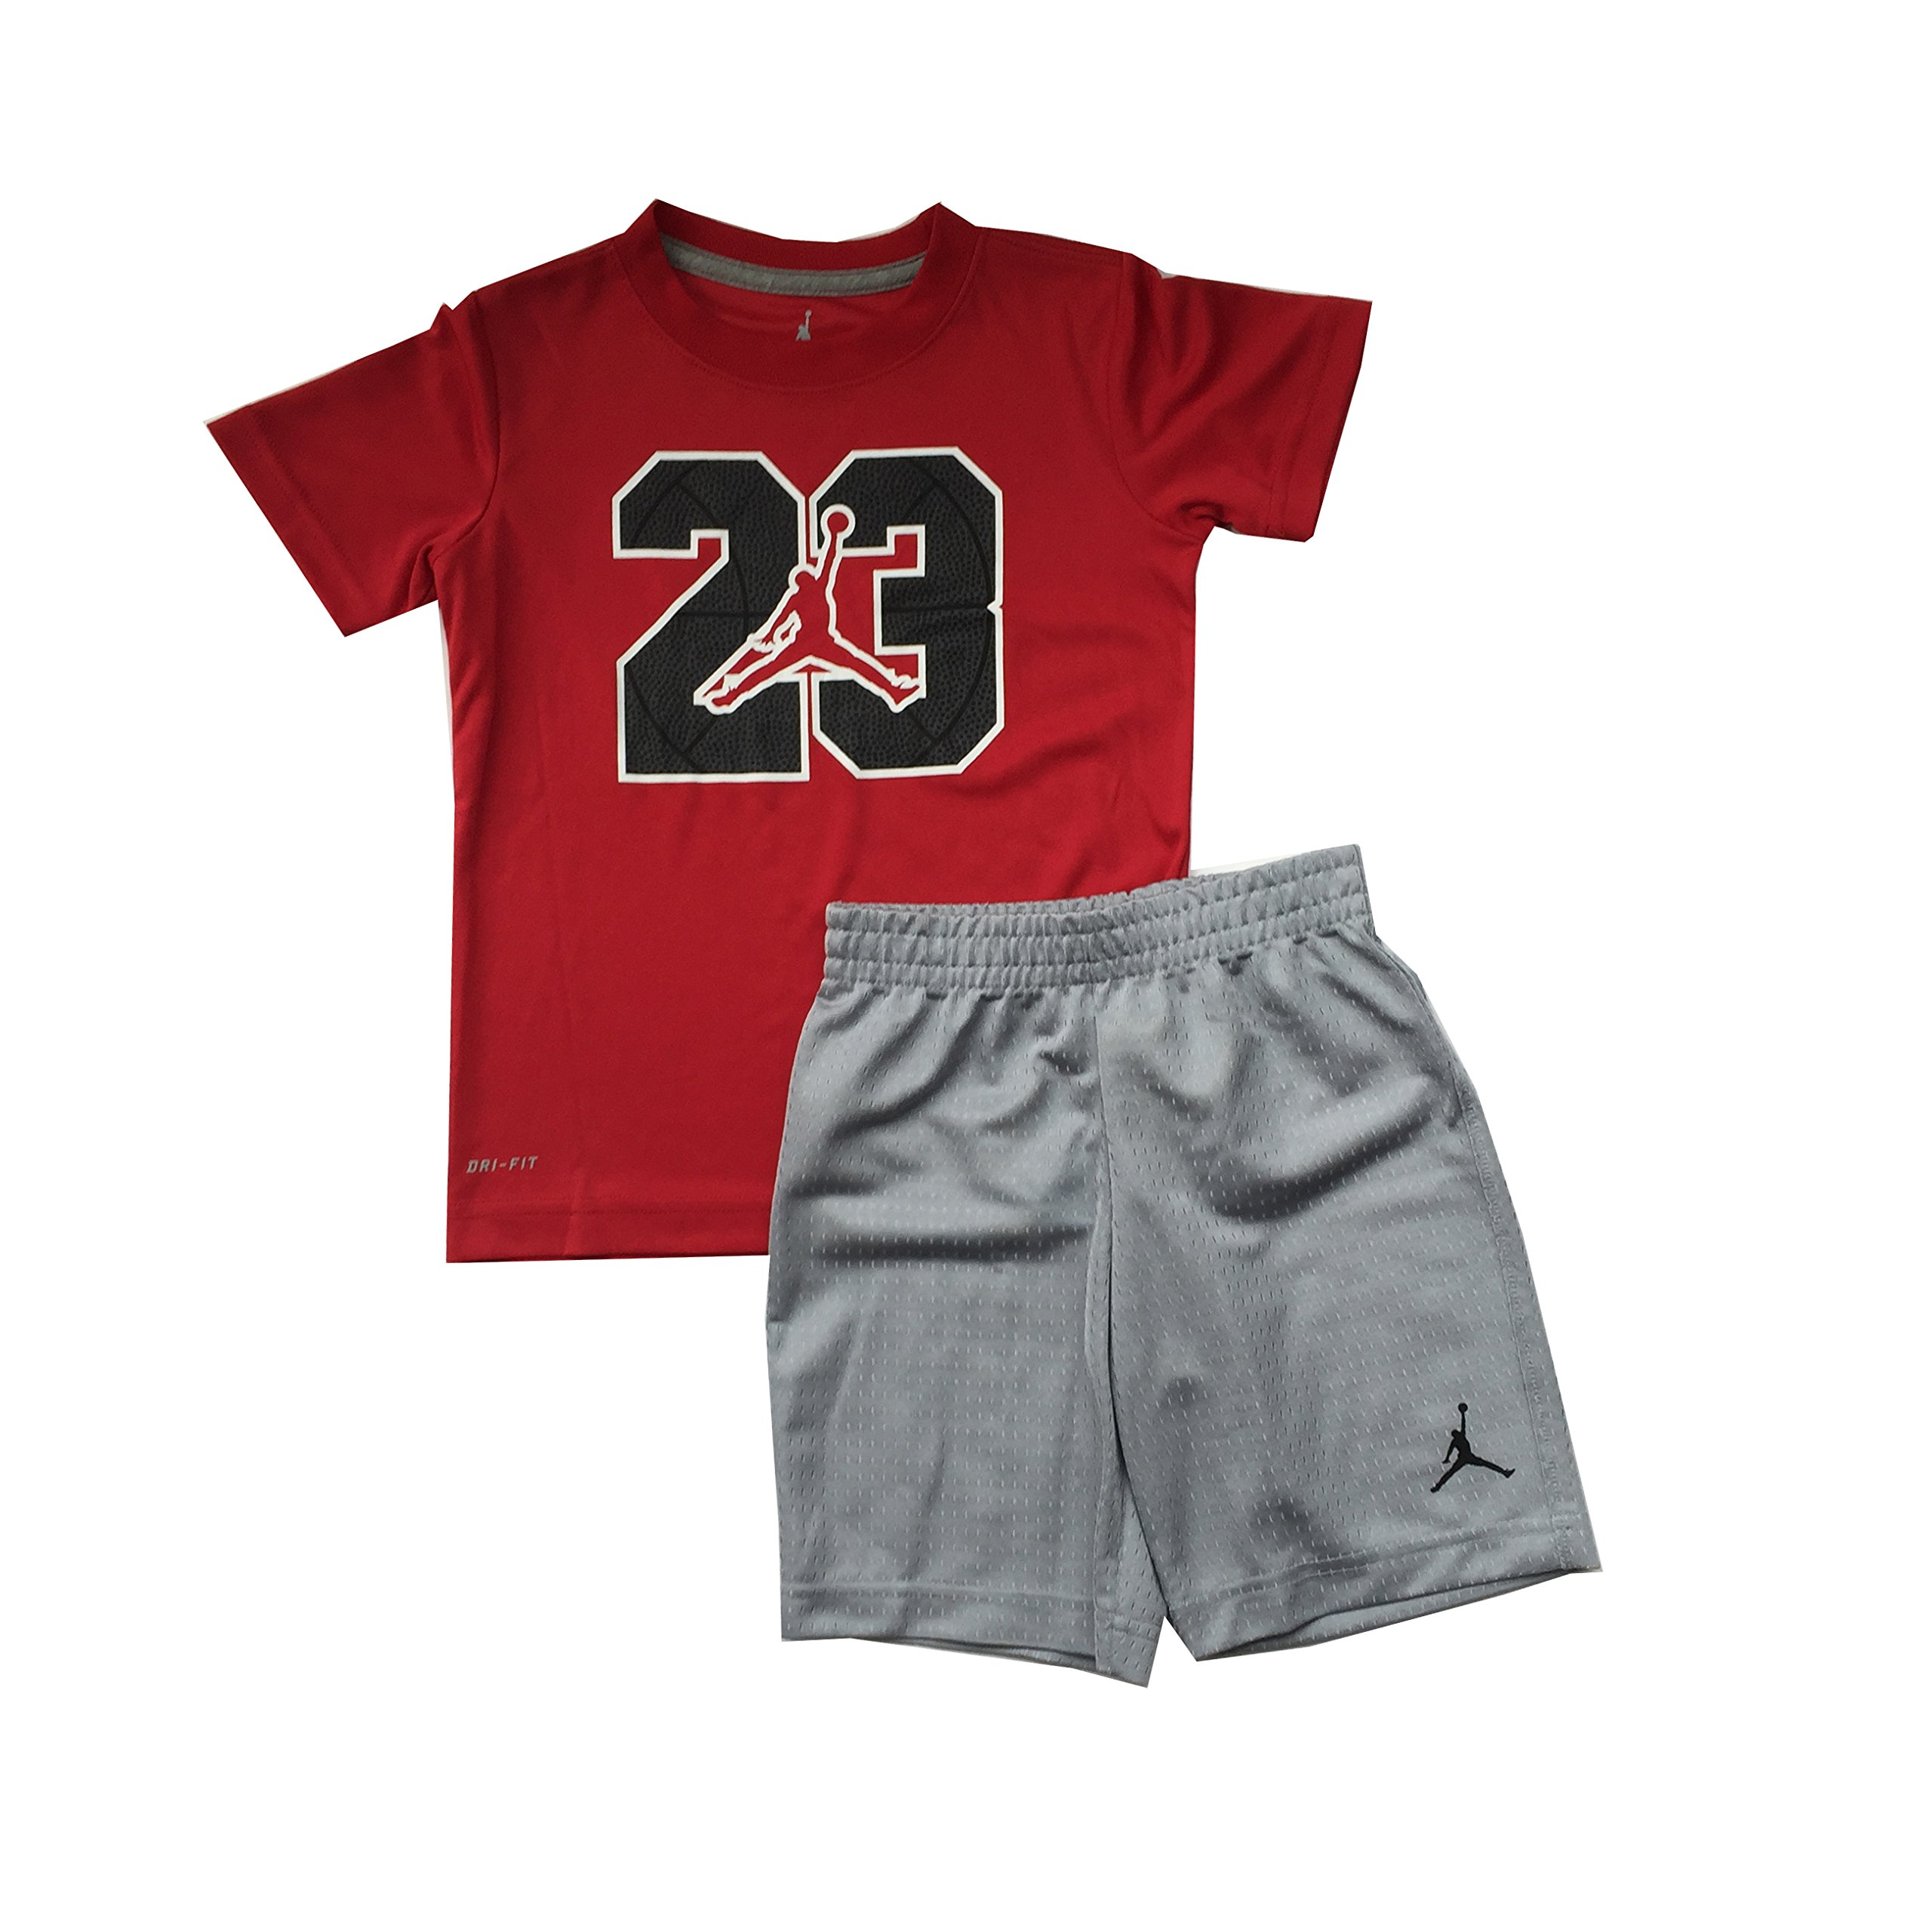 8c04dd31369a Galleon - Jordan Jumpman 23 Logo Little Boys Tee Shirt And Shorts Set  Red Wolf Grey Size 6